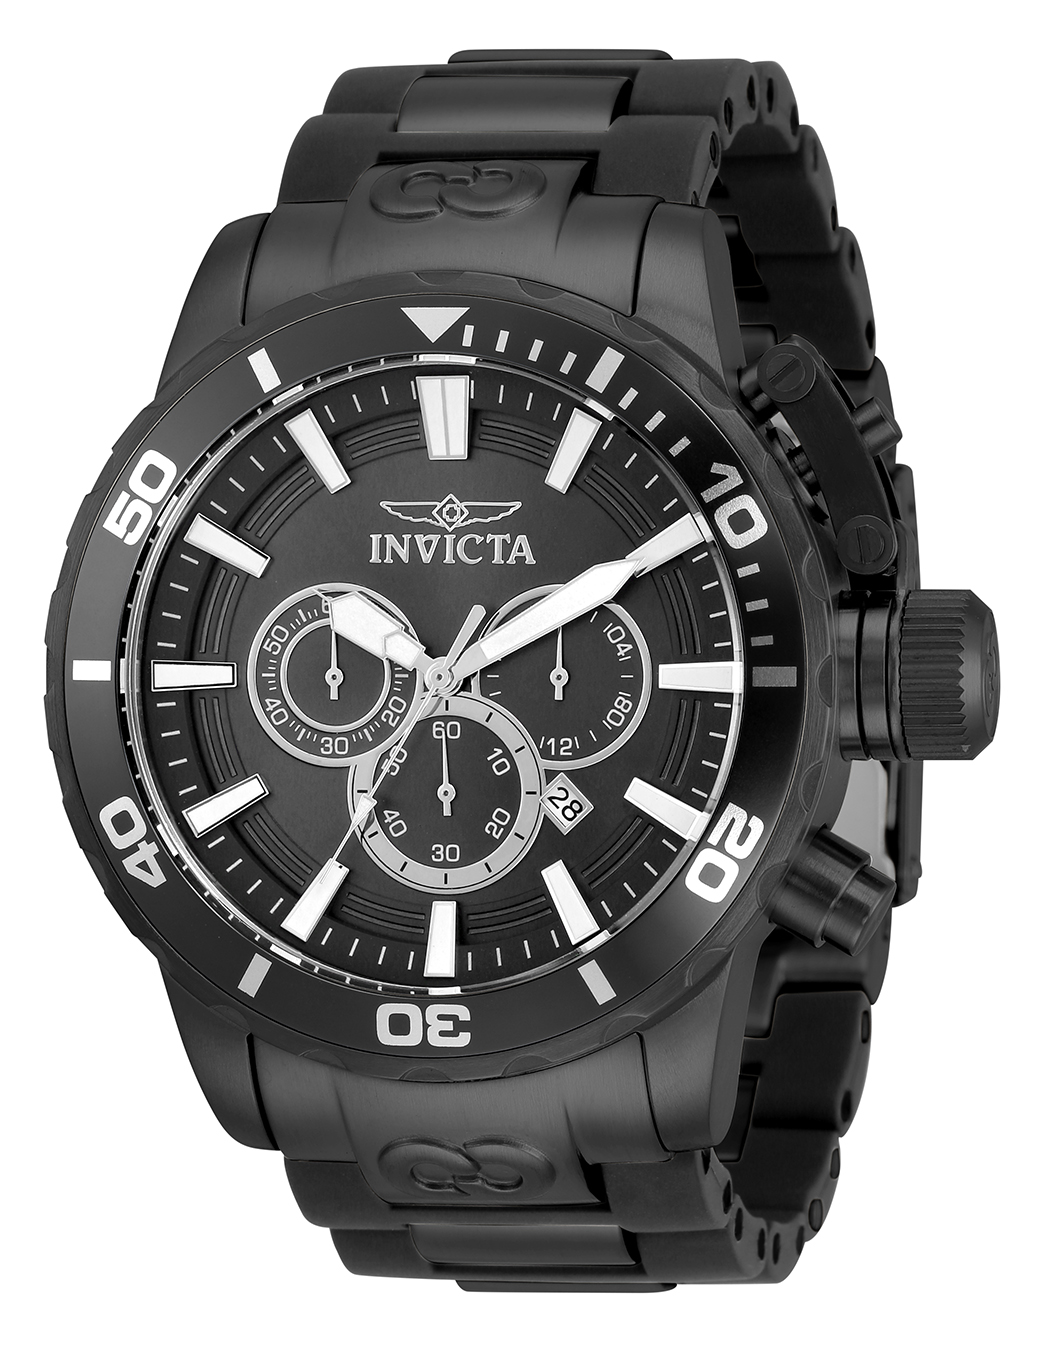 Invicta Corduba Quartz Mens Watch - 52mm Stainless Steel Case, Stainless Steel/Polyurethane Band, Black, Gunmetal (33697)